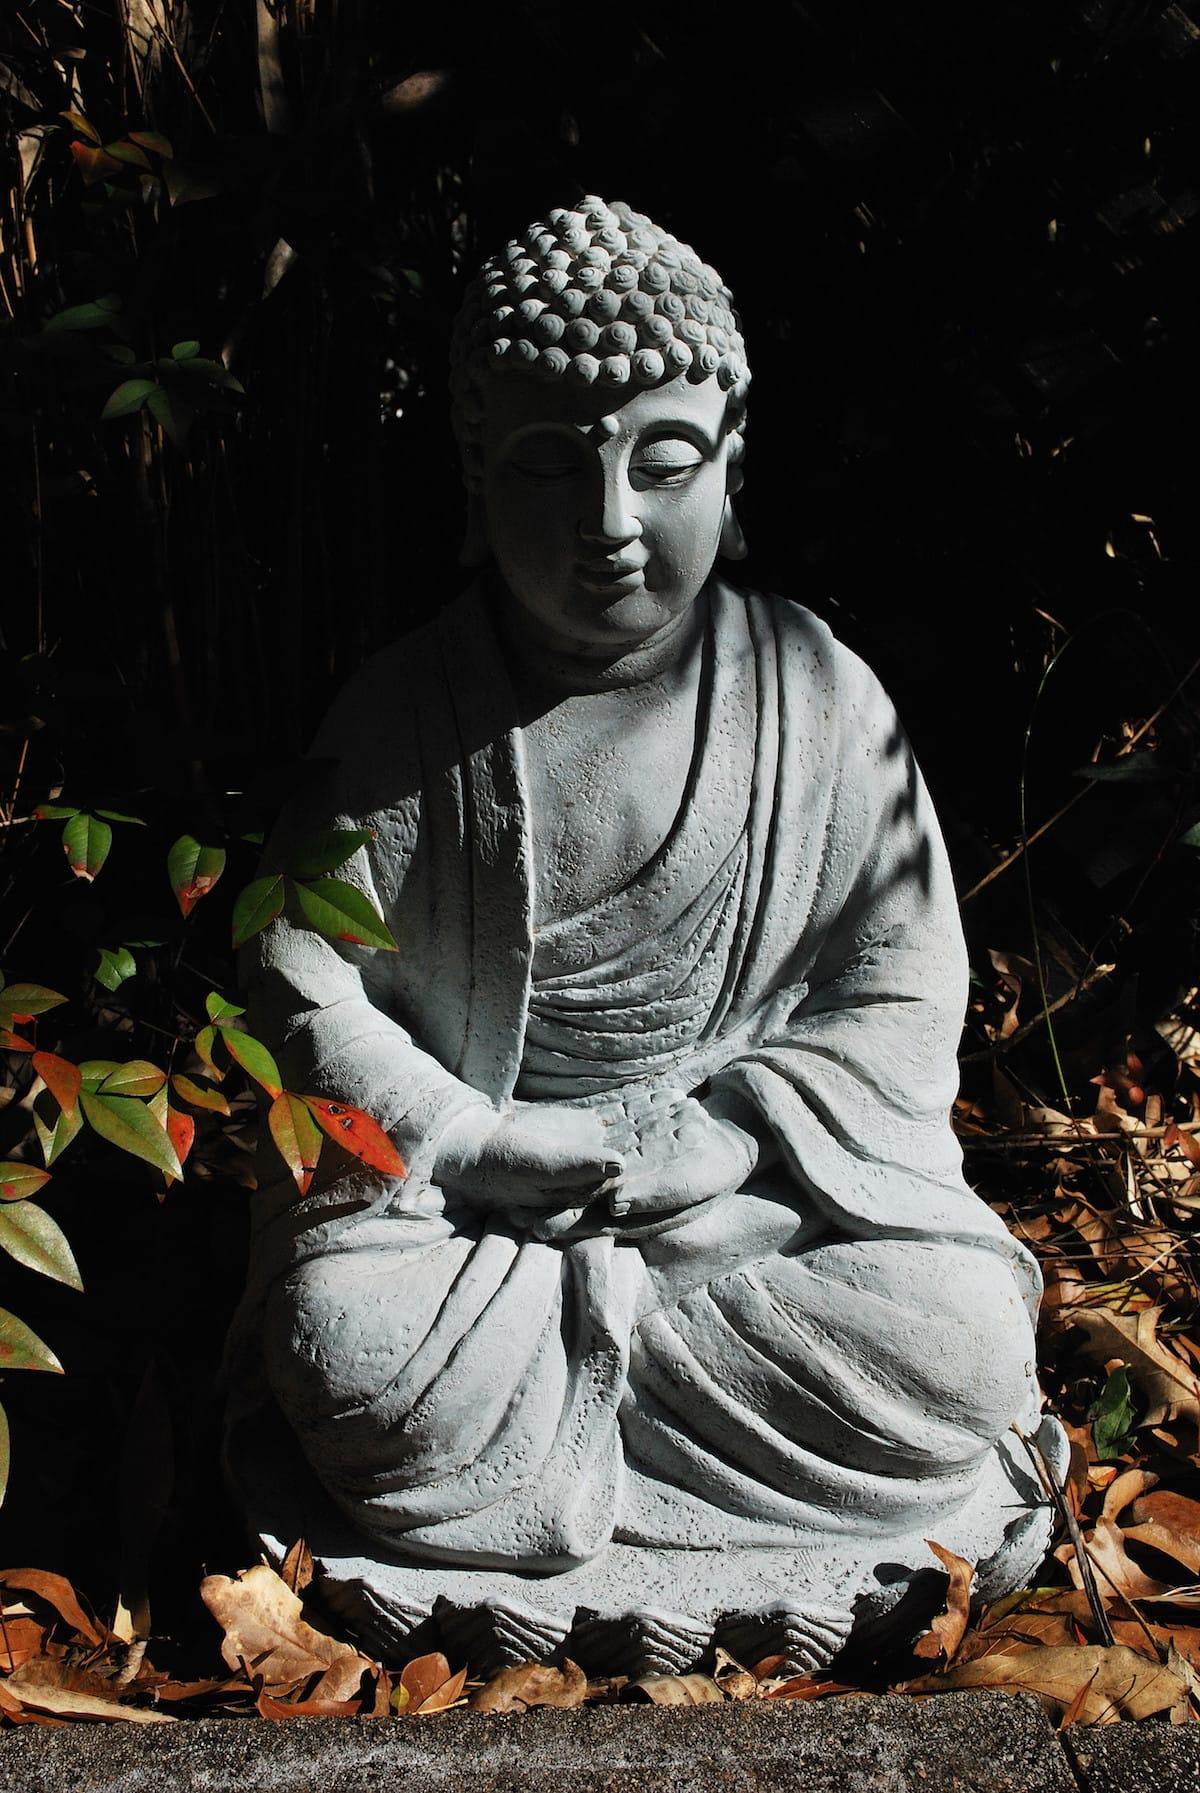 Buddhism Lion's Roar Four Noble Truths Mahayana Shambhala Sun Theravada Tulku Thondup Rinpoche Vajrayana / Tibetan Buddhism